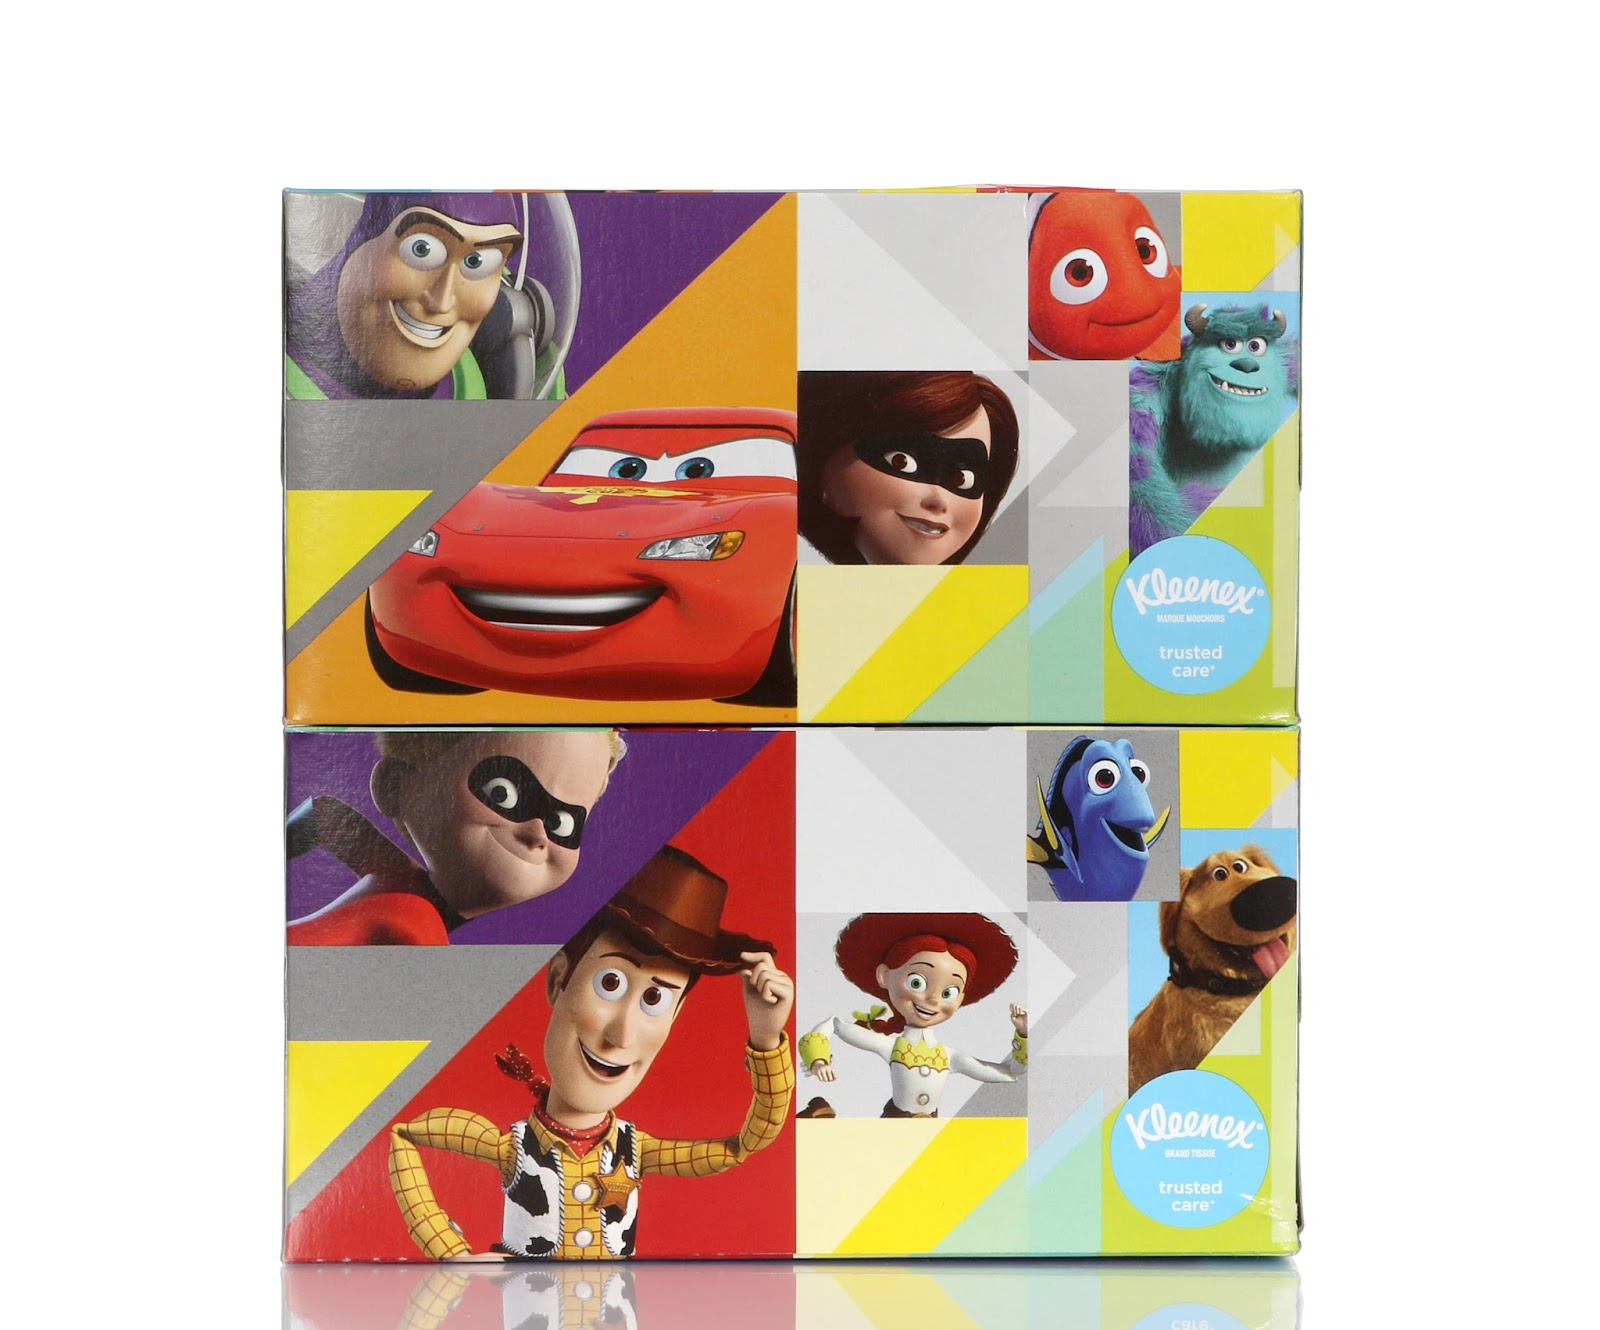 disney pixar characters kleenex tissues